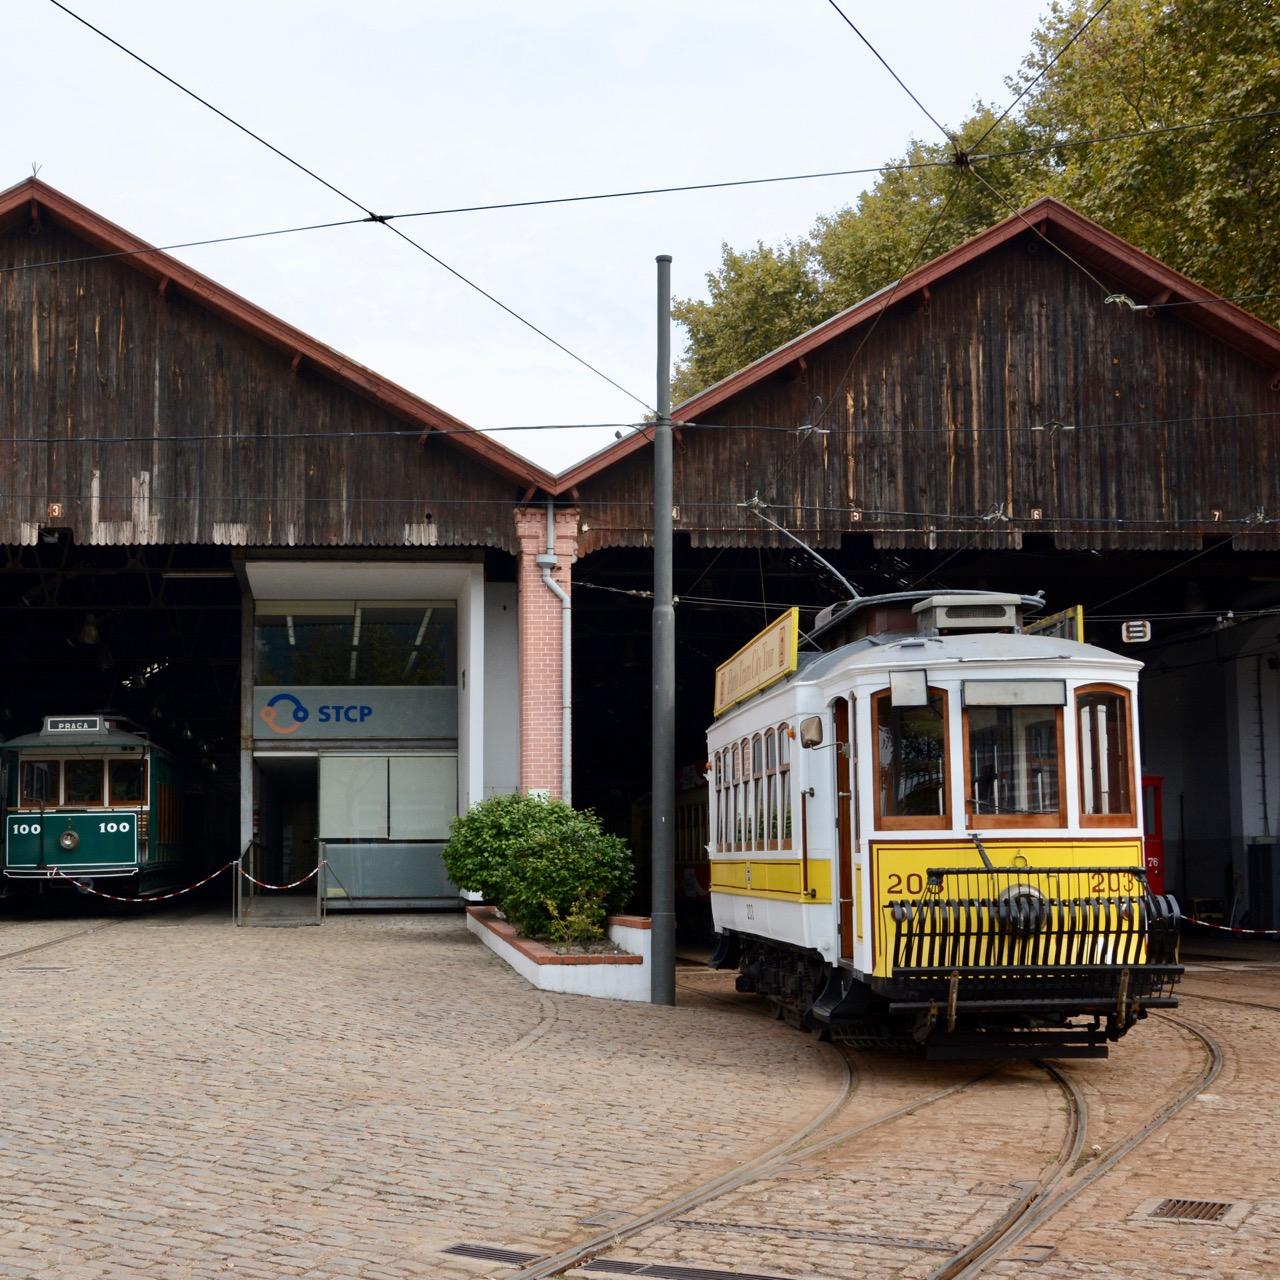 travel with kids children porto portugal tram museum